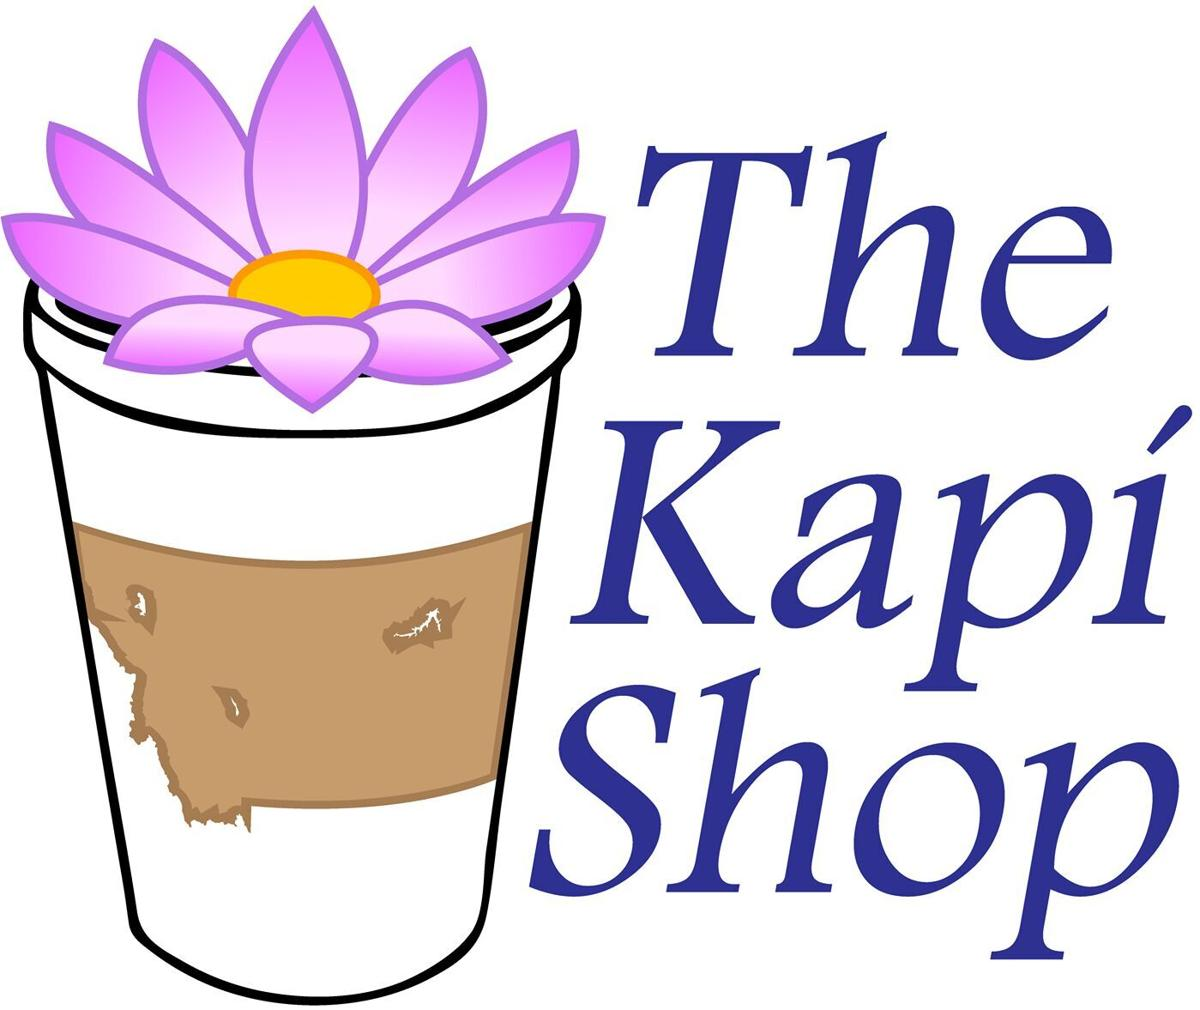 Kapì Shop